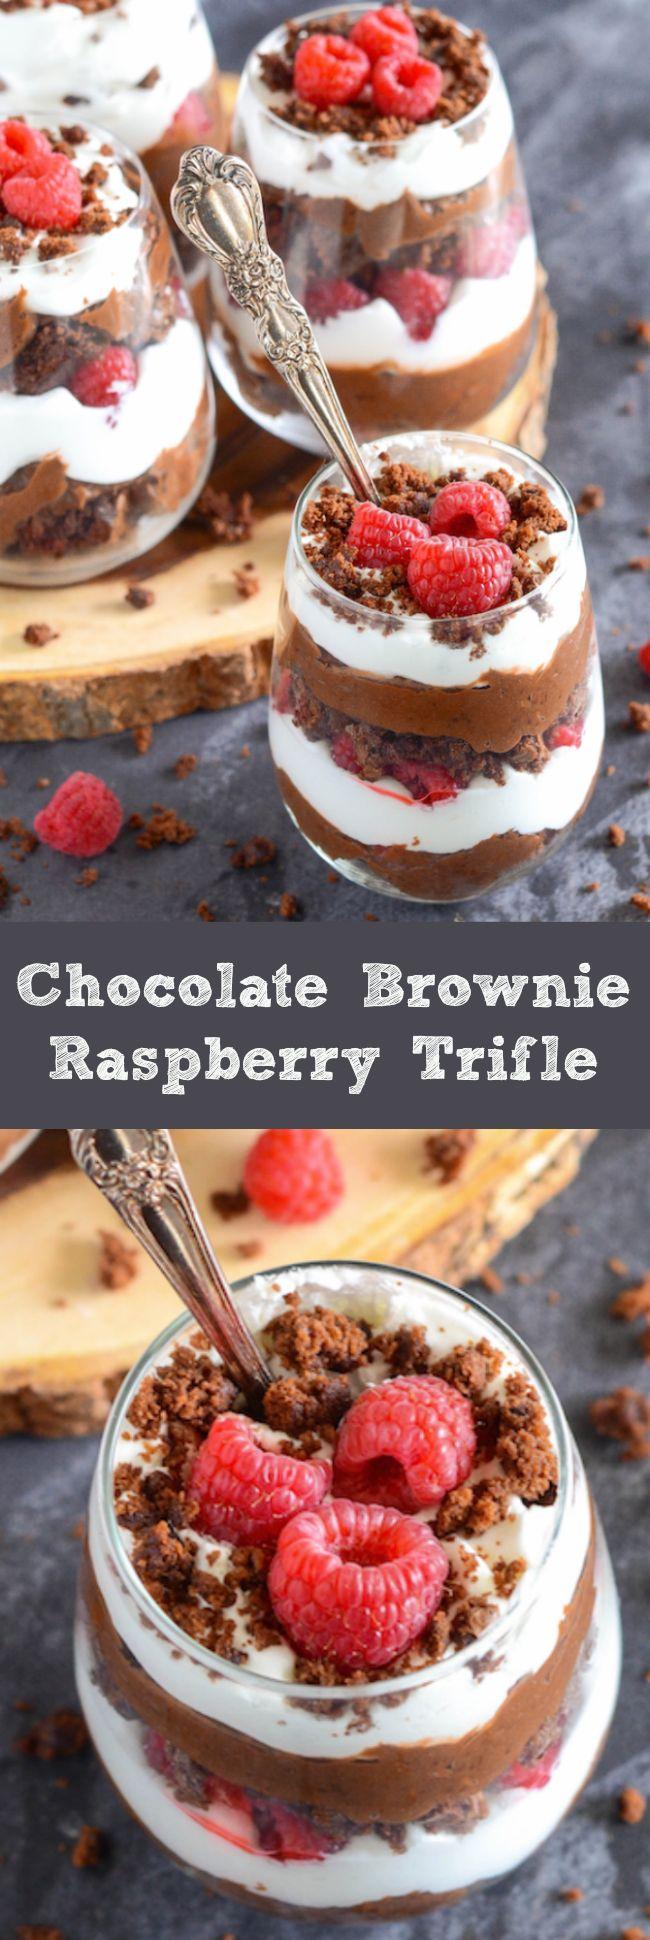 Chocolate Brownie Raspberry Trifle with brownies, chocolate pudding, raspberries and cream!